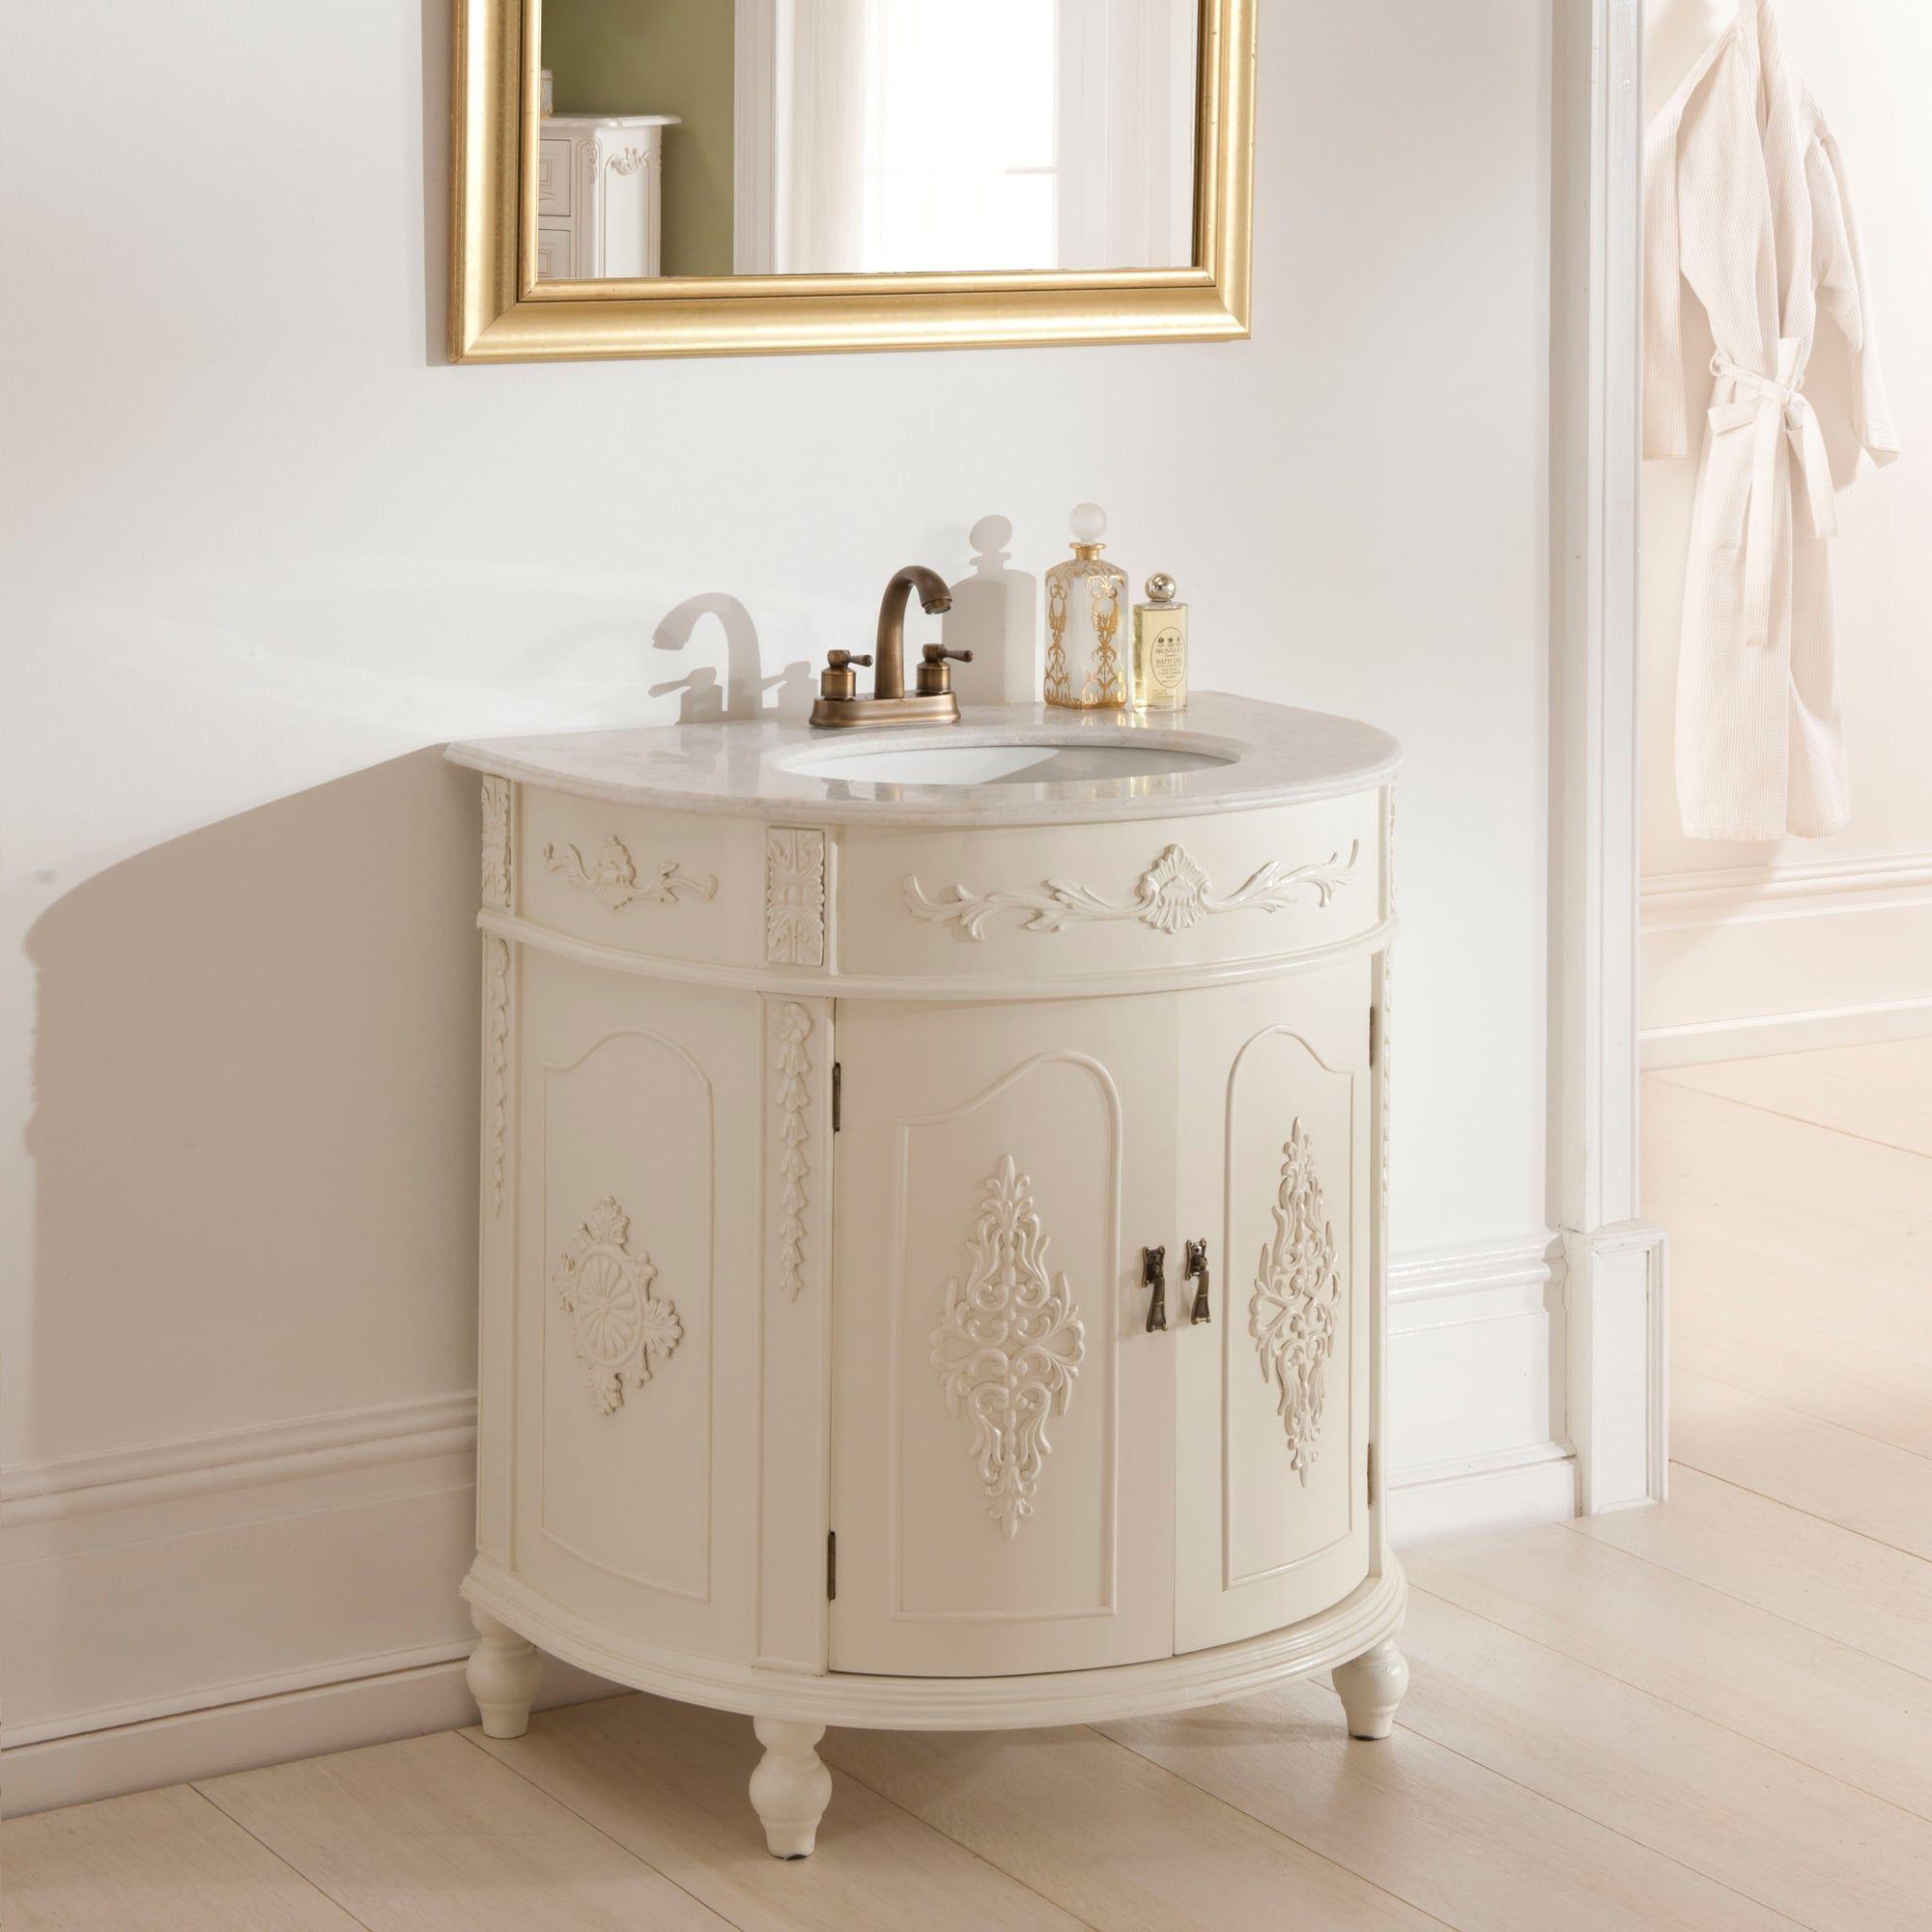 Antique French Style Vanity Unit bathrooms Pinterest